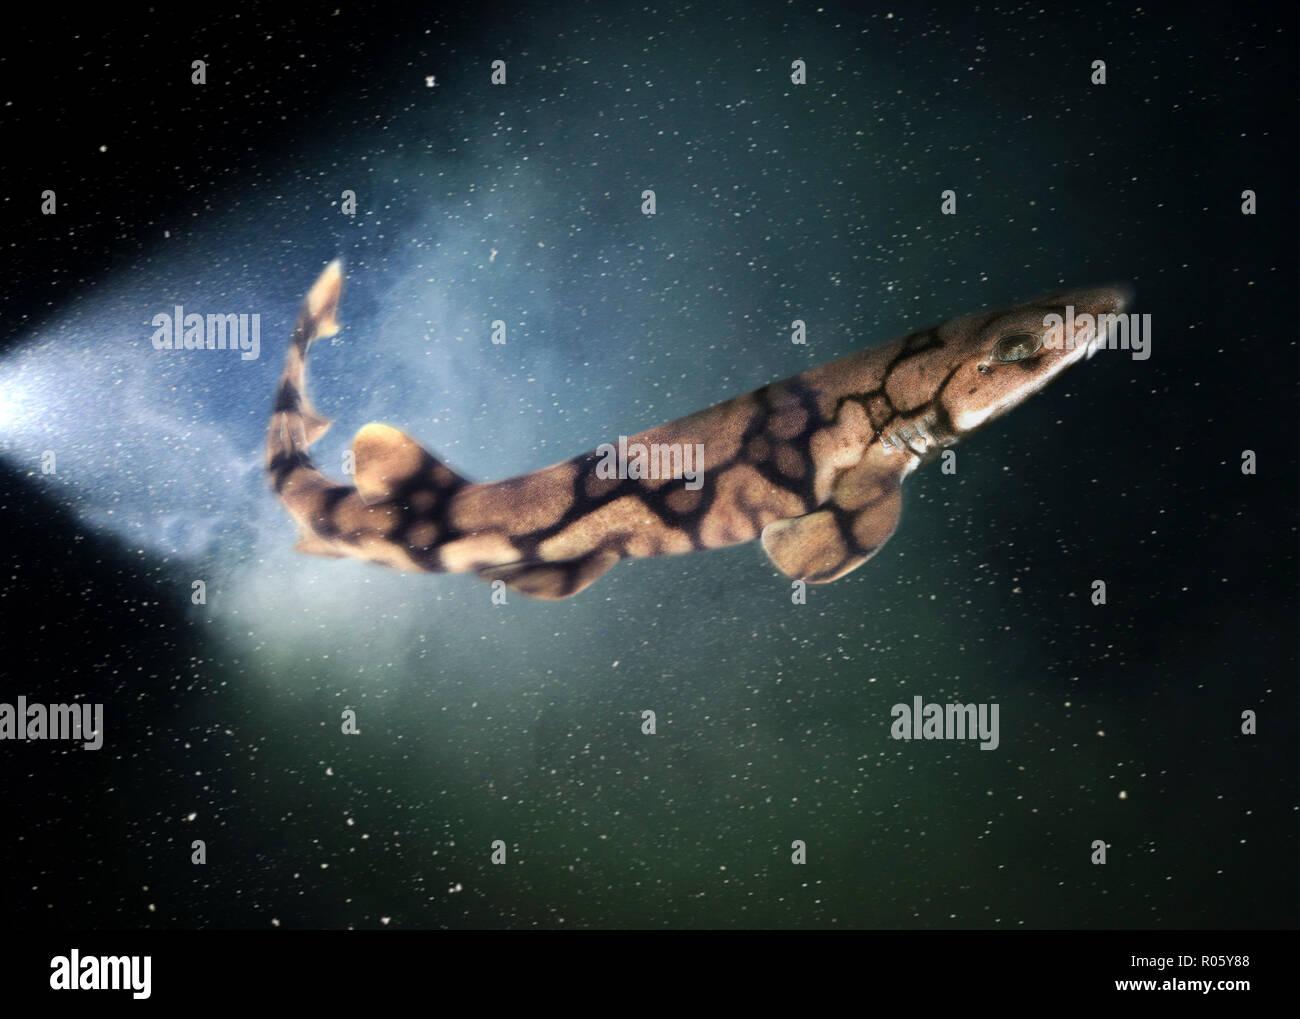 Chain catshark or chain dogfish, Scyliorhinus retifer, swimming. Is one of four elasmobranch species shown to possess biofluorescent properties. - Stock Image